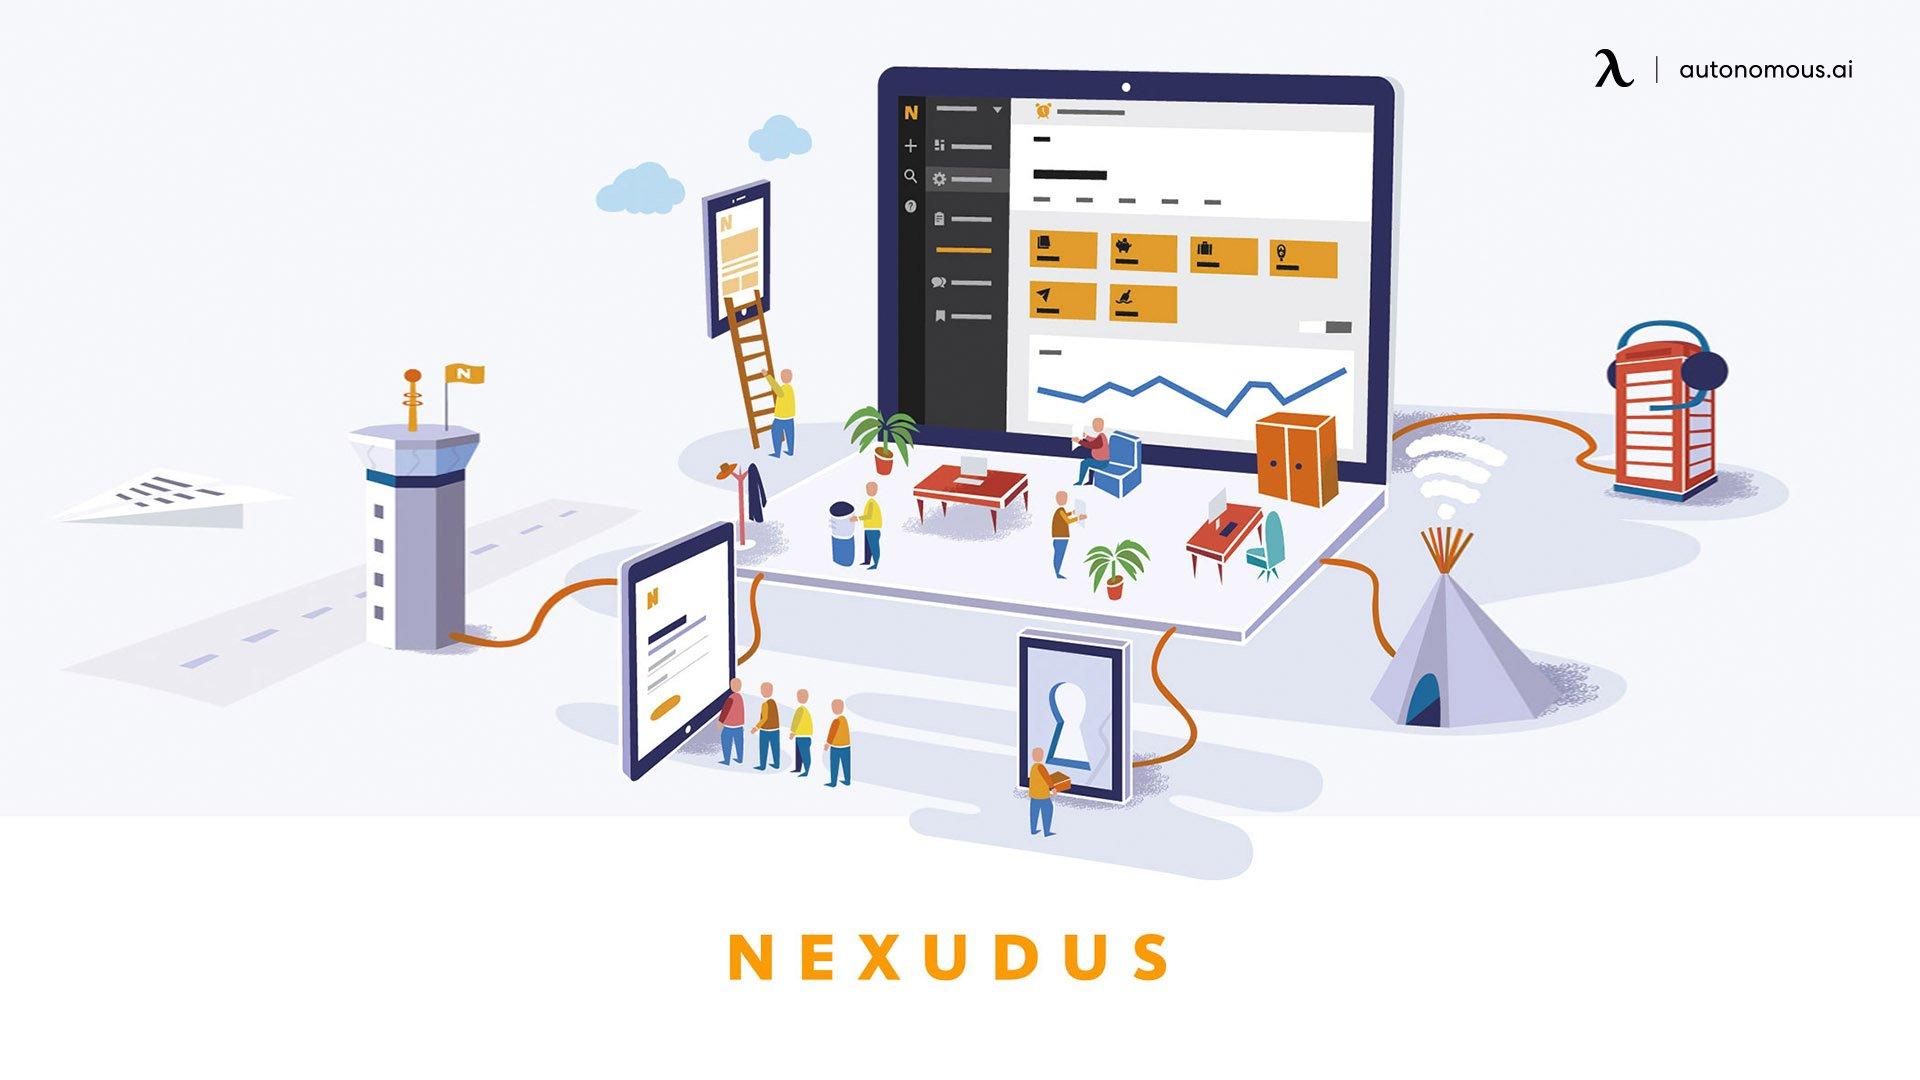 Neduxus